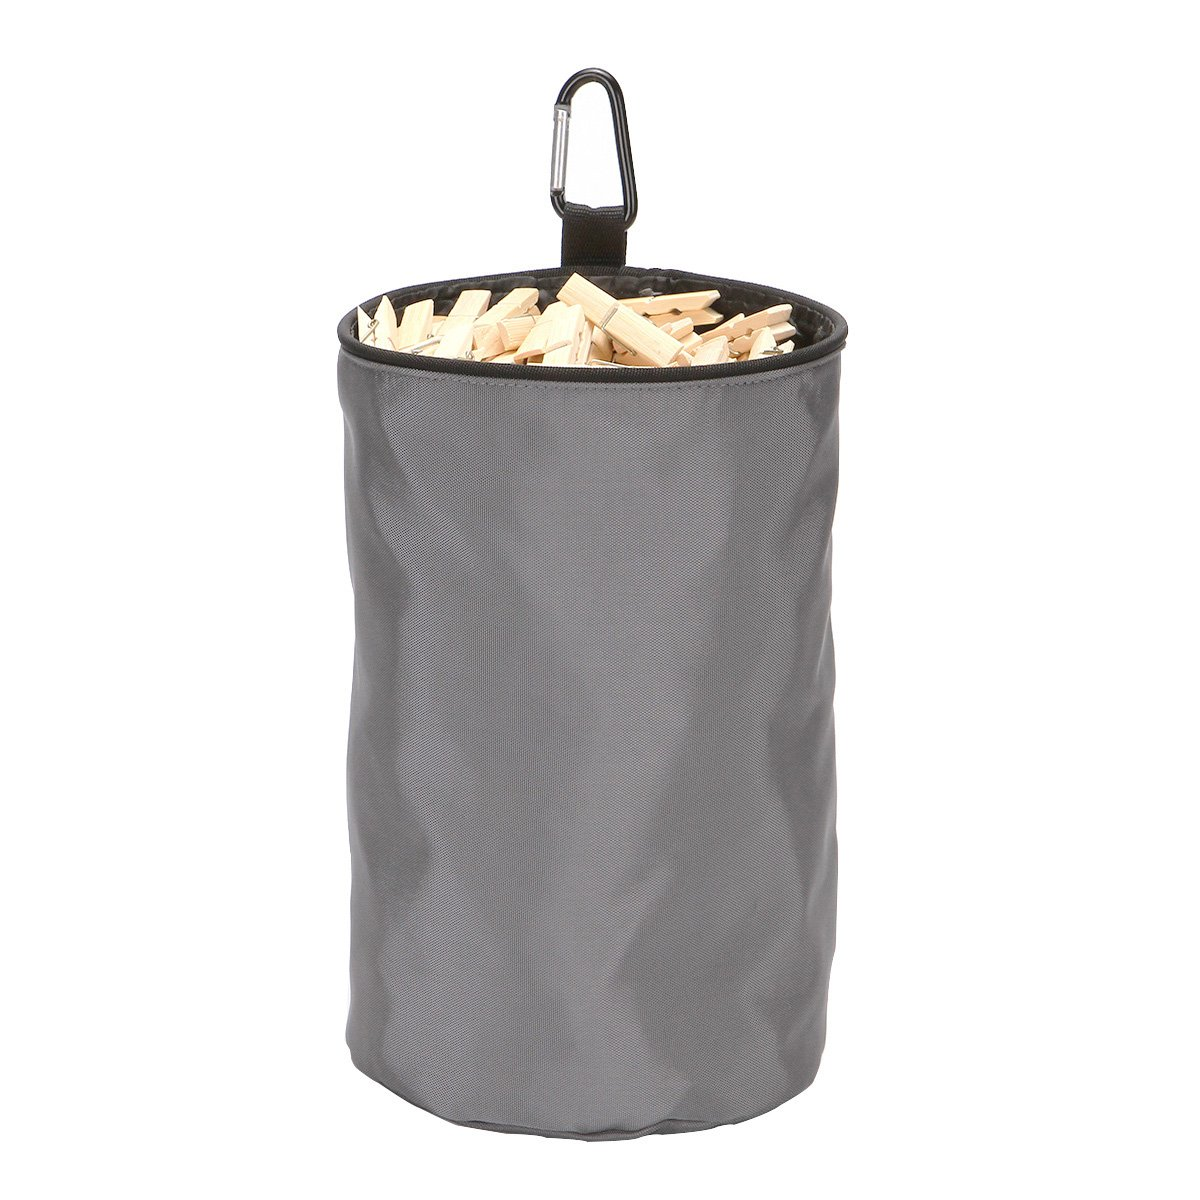 VEAMOR Clothespins Bag Hanging Clothesline Peg Organizer Storage Bags,Dust-Proof (Grey)